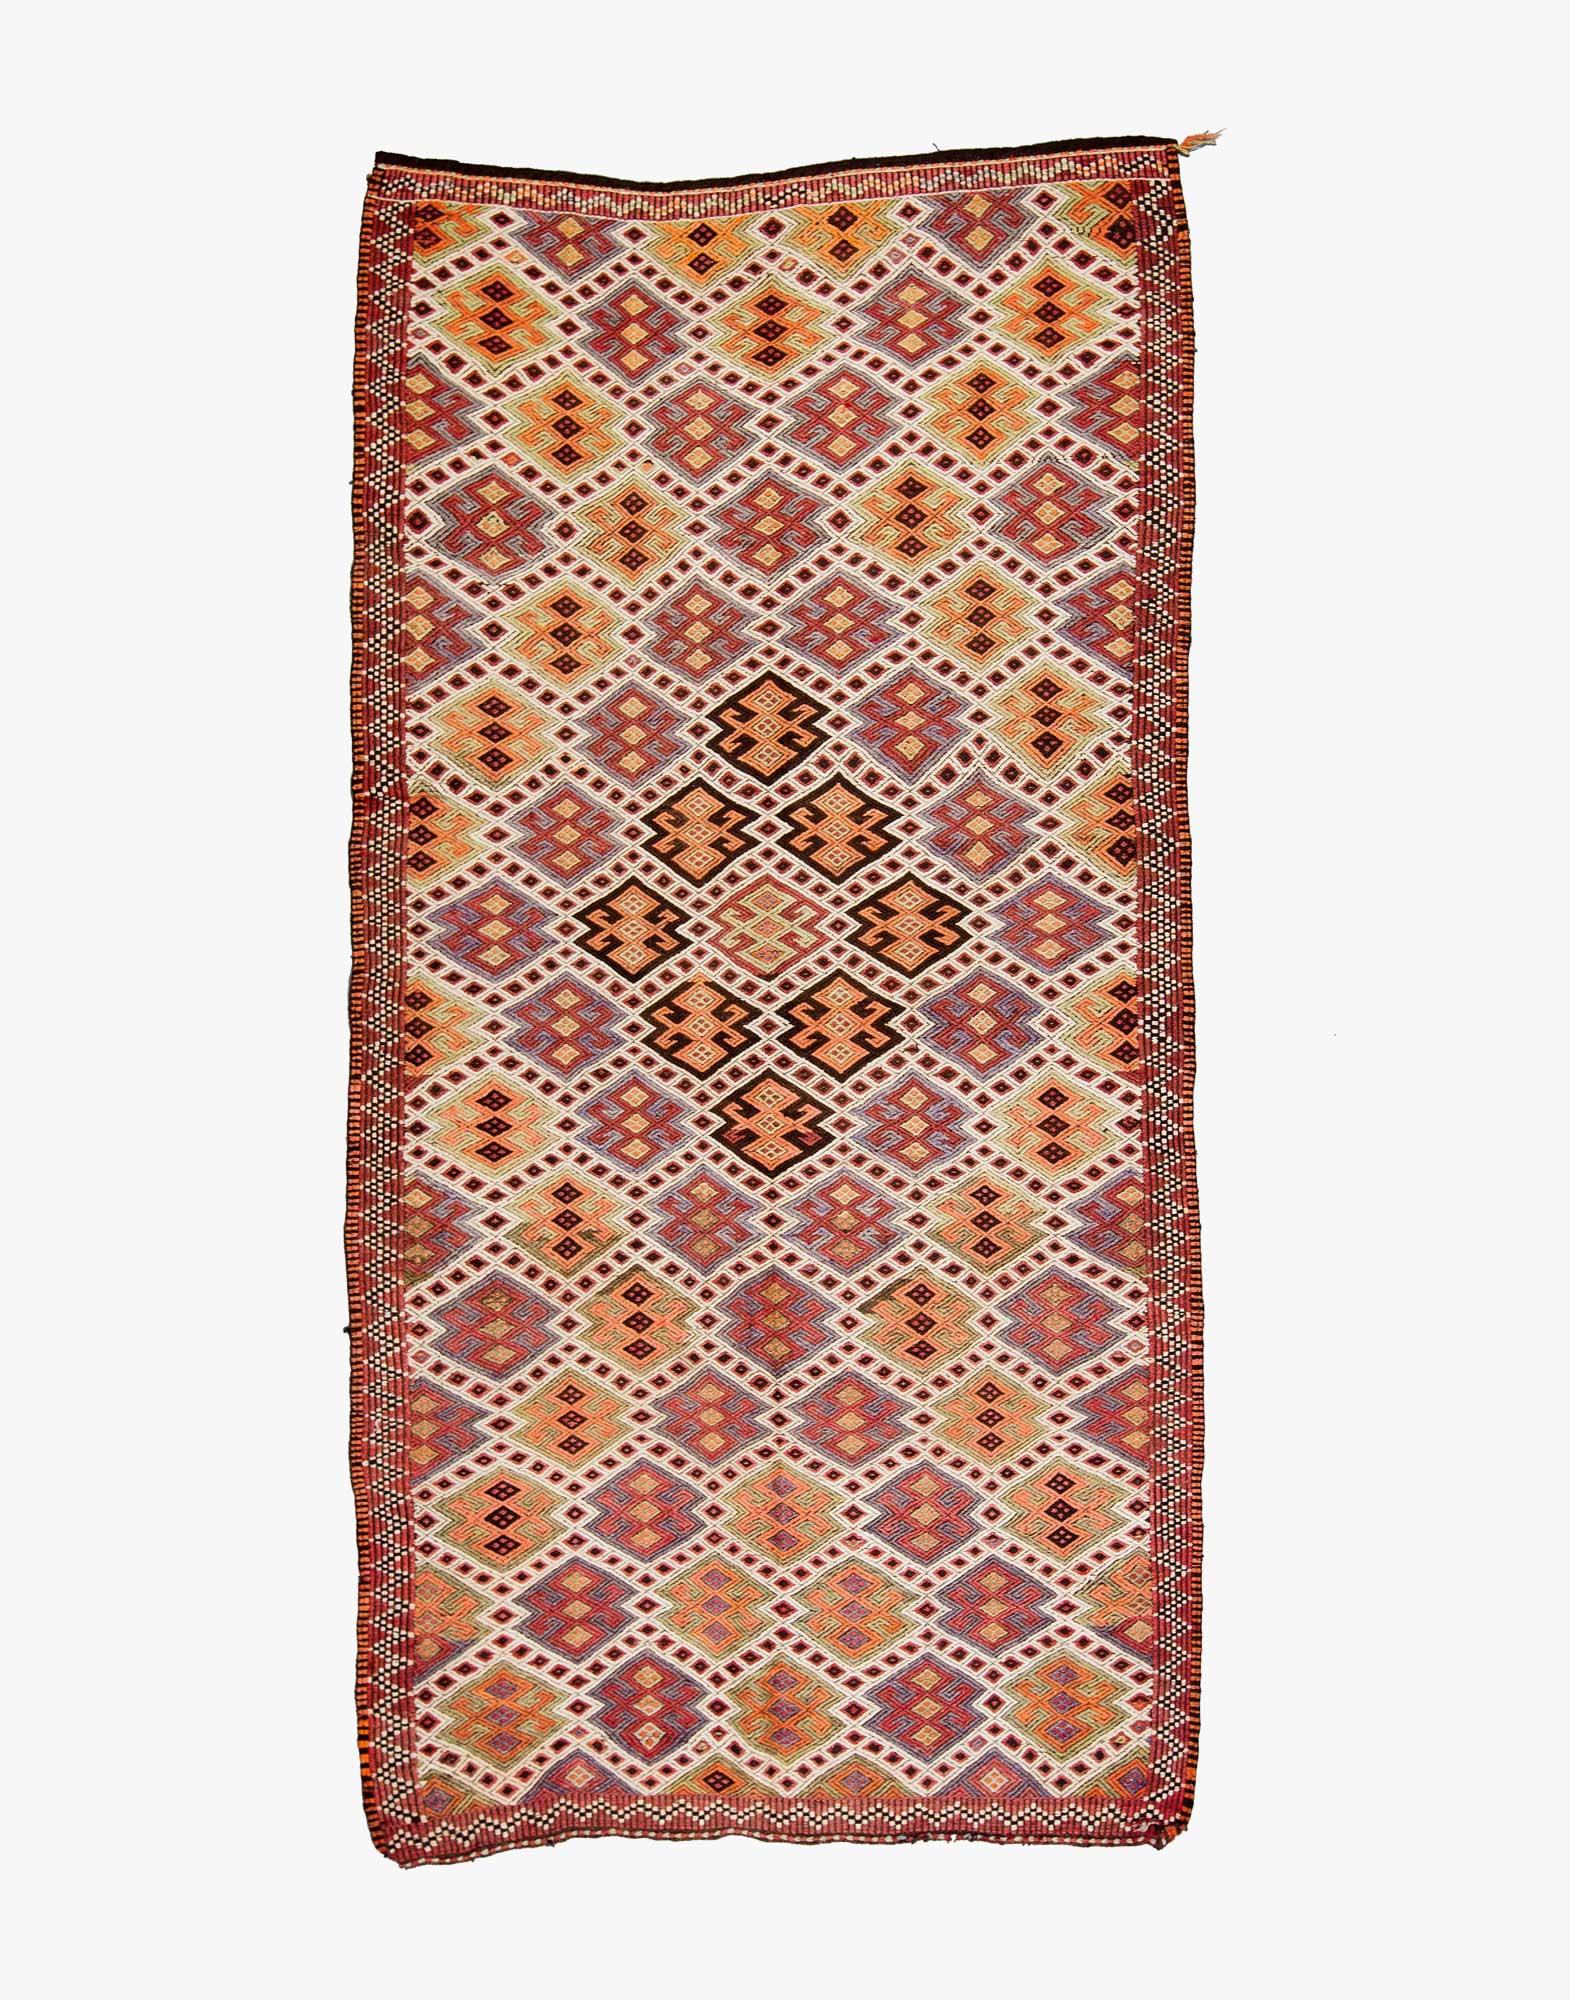 Mut Cicim Embroidered Kilim